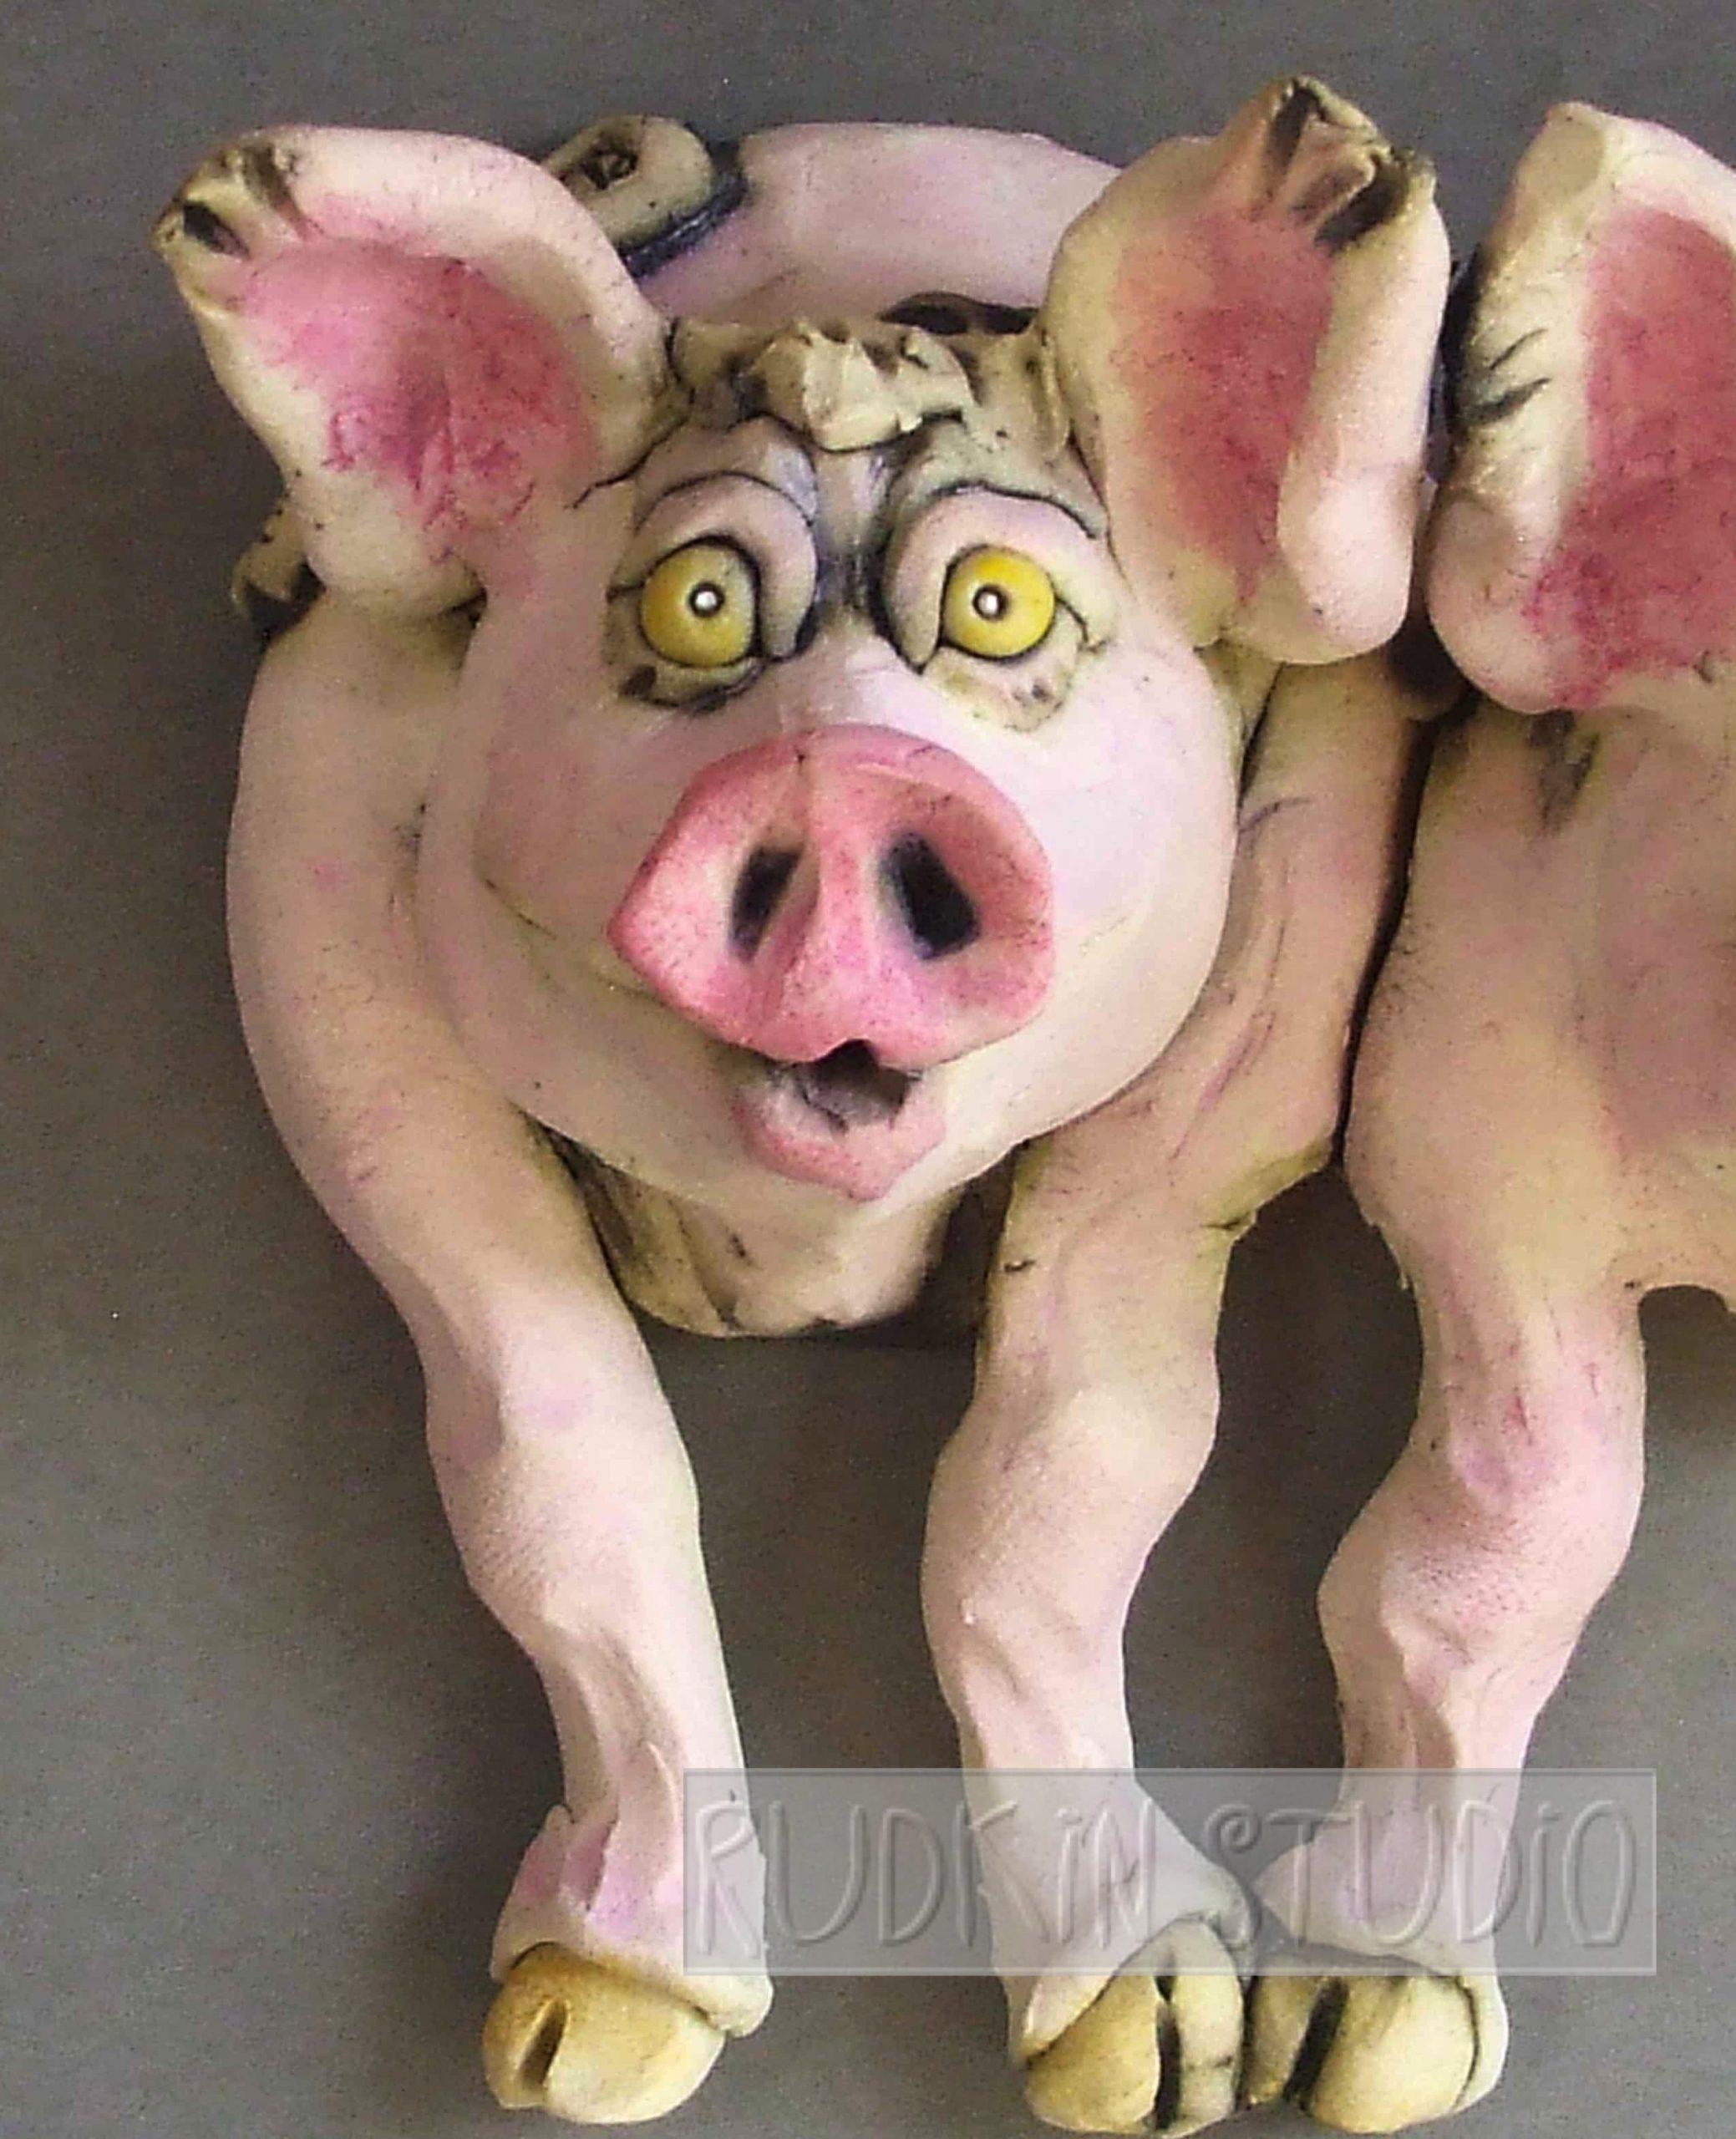 Three Little Pigs 2b